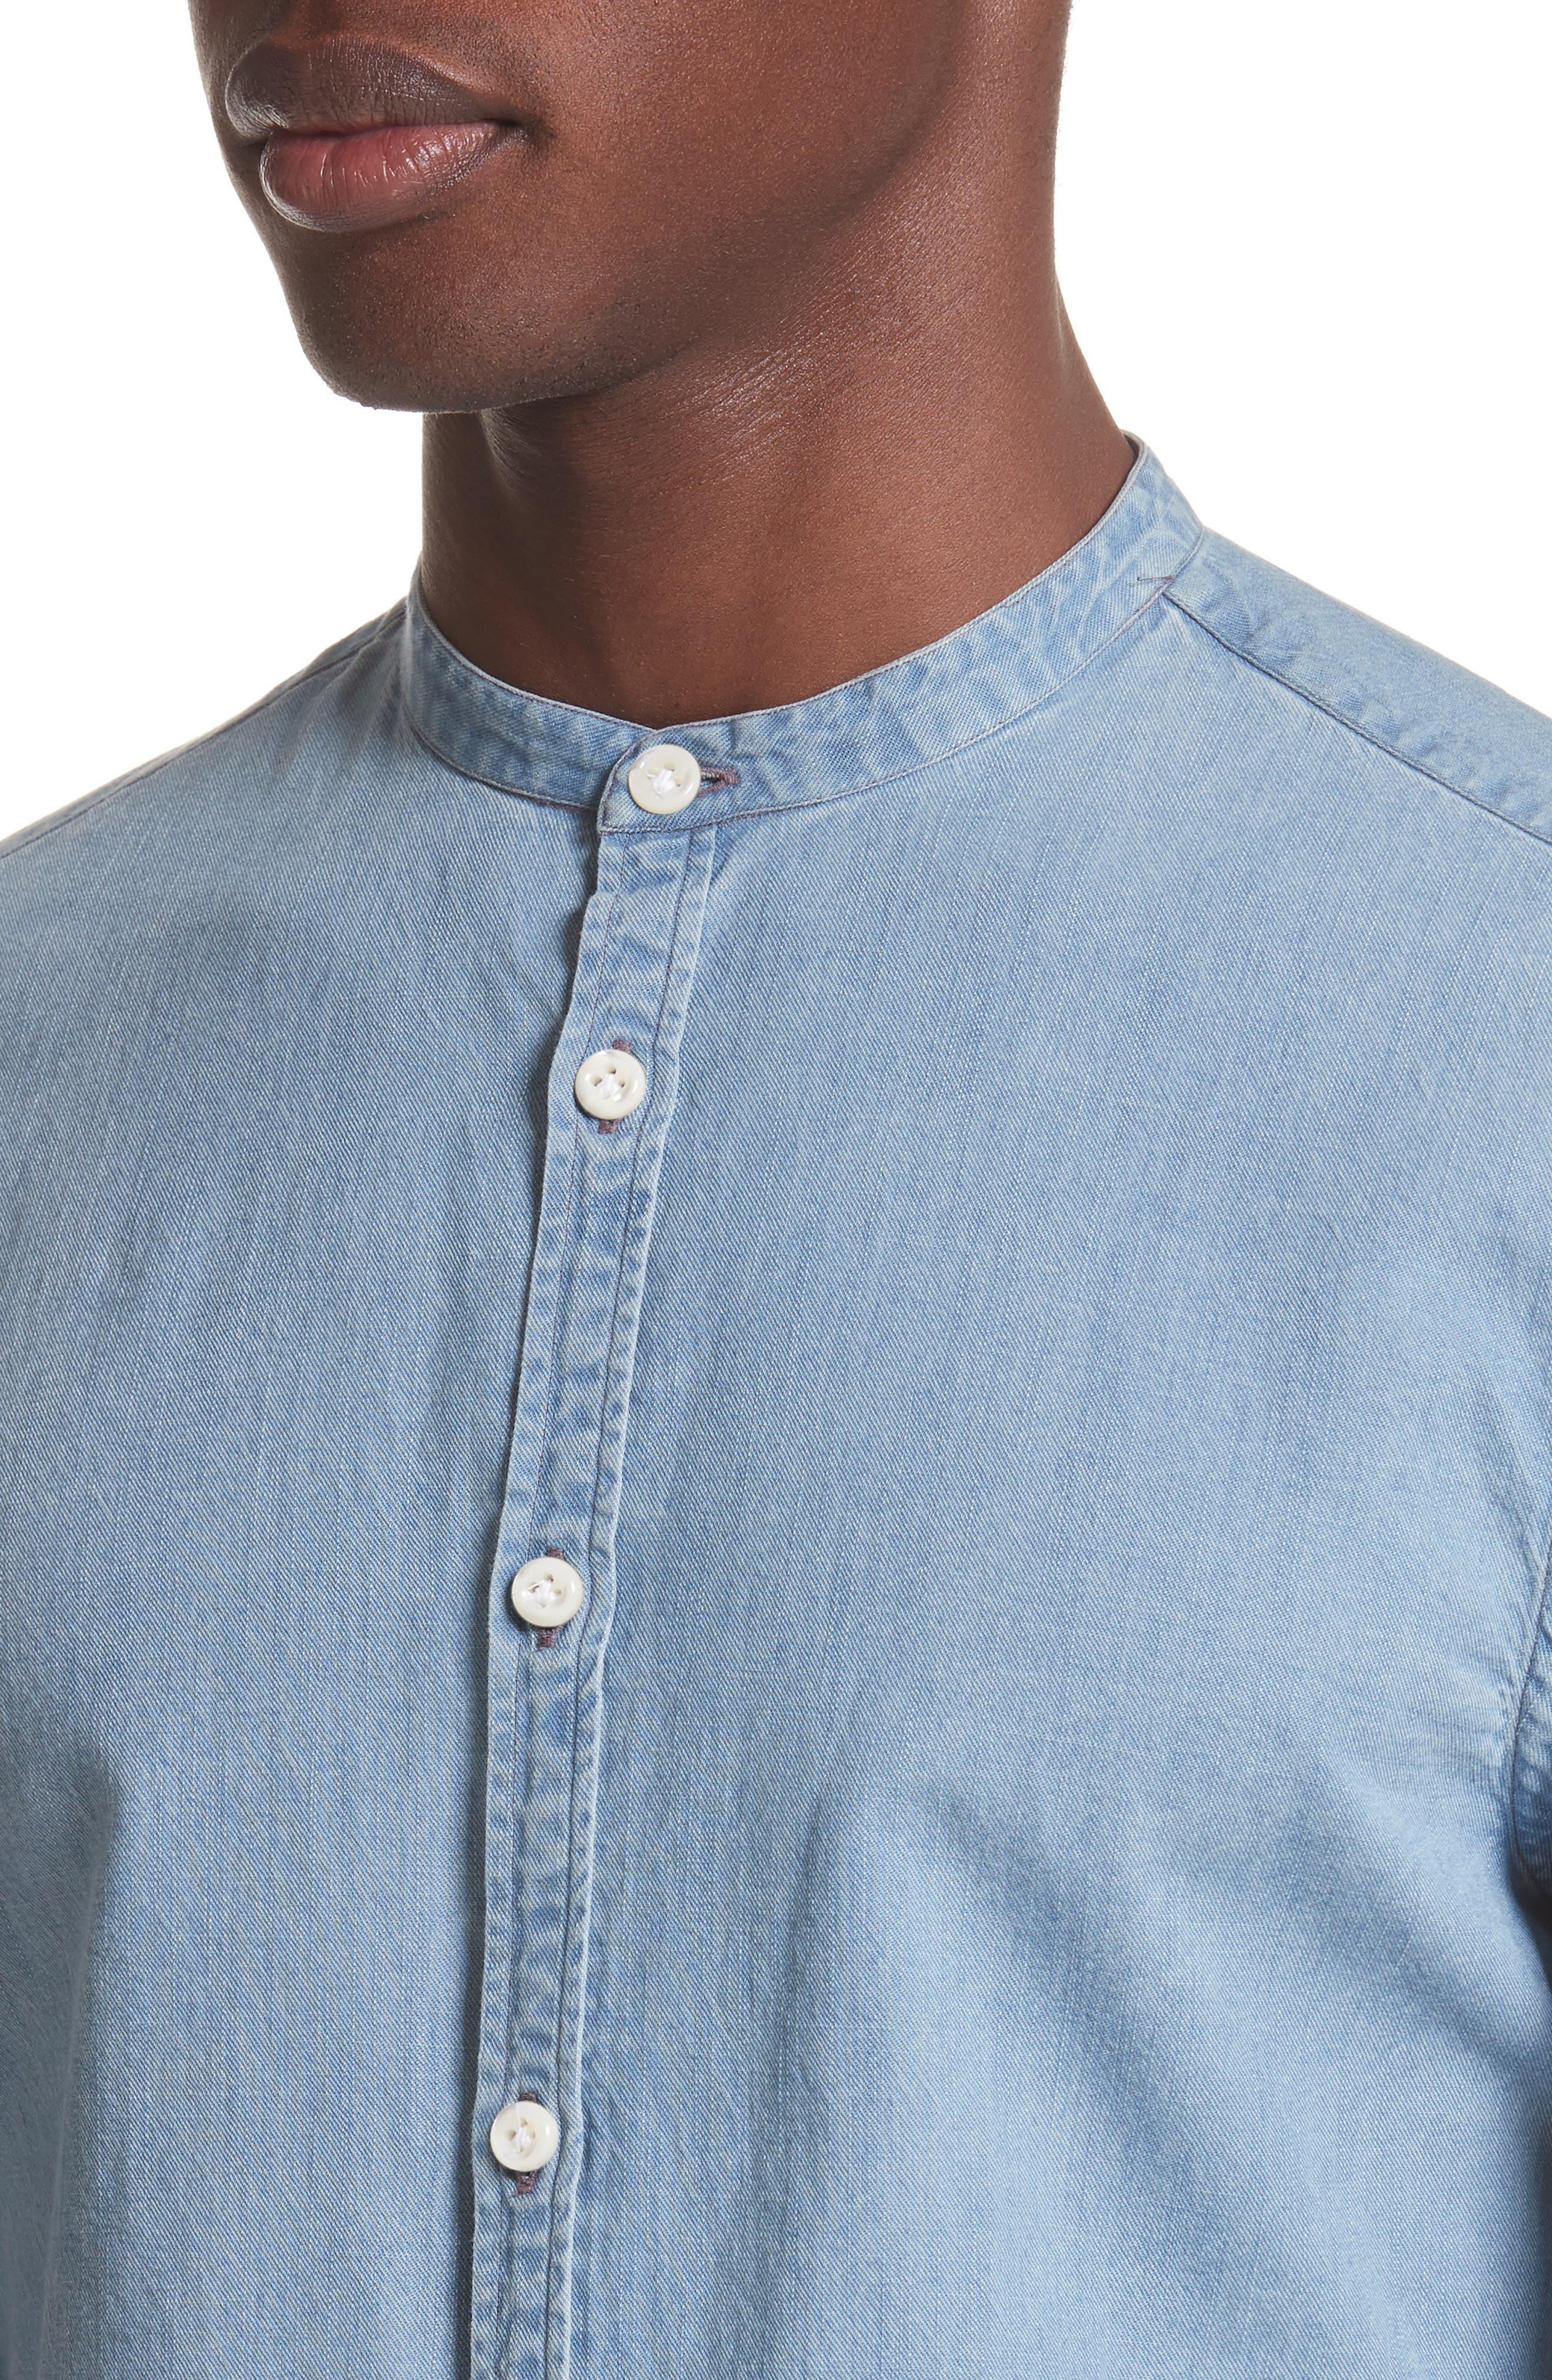 Napoli Washed Denim Band Collar Shirt,                             Alternate thumbnail 4, color,                             451